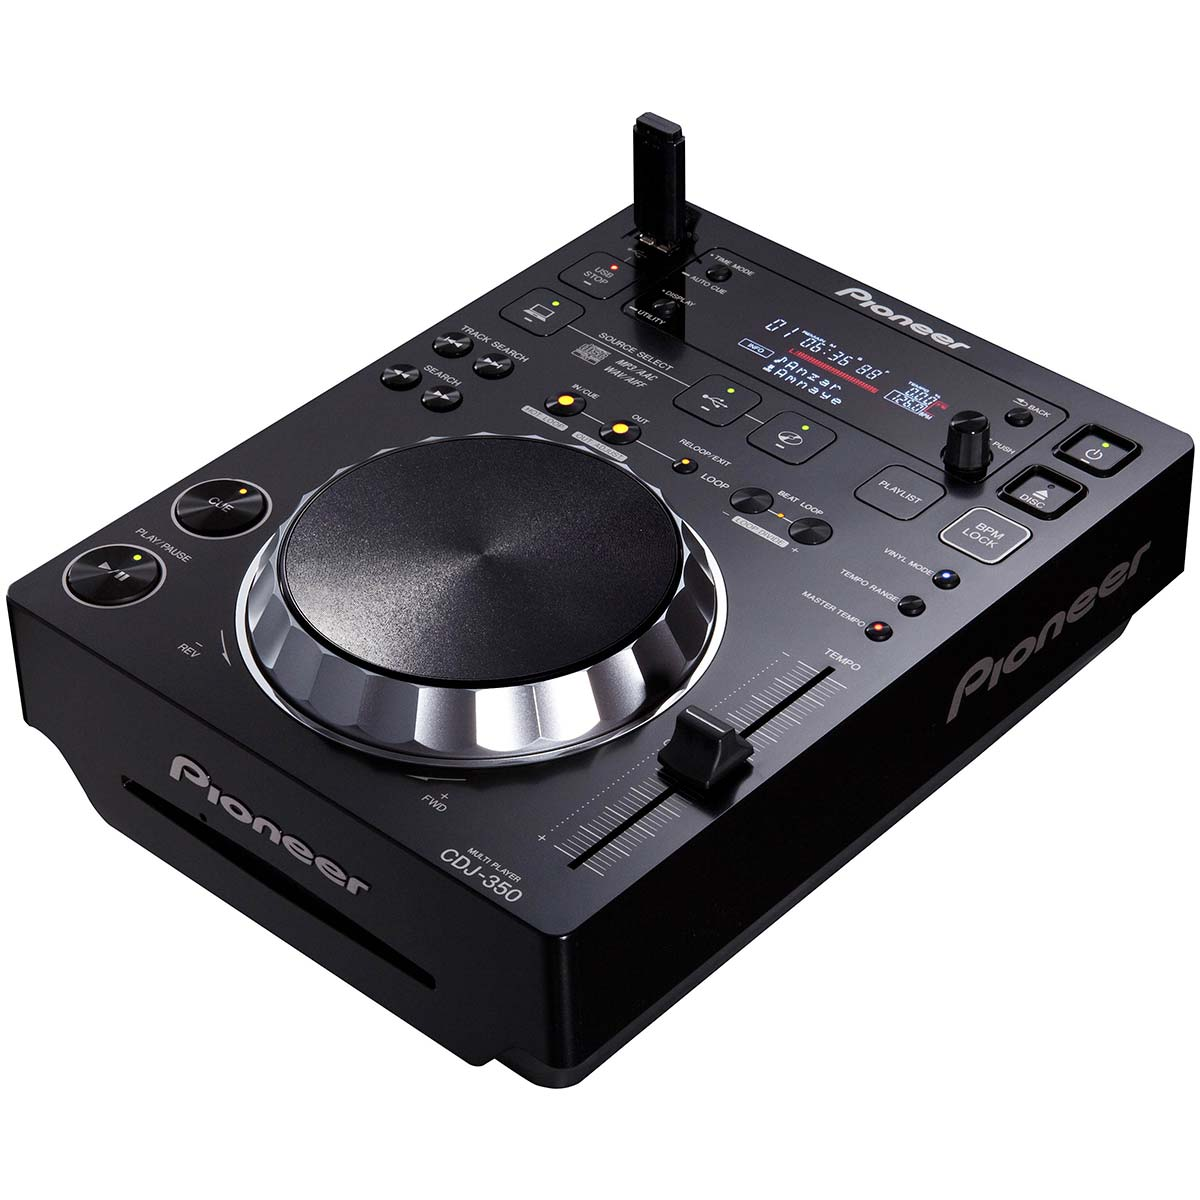 CDJ350 - CDJ Player c/ USB Preto CDJ 350 - Pioneer